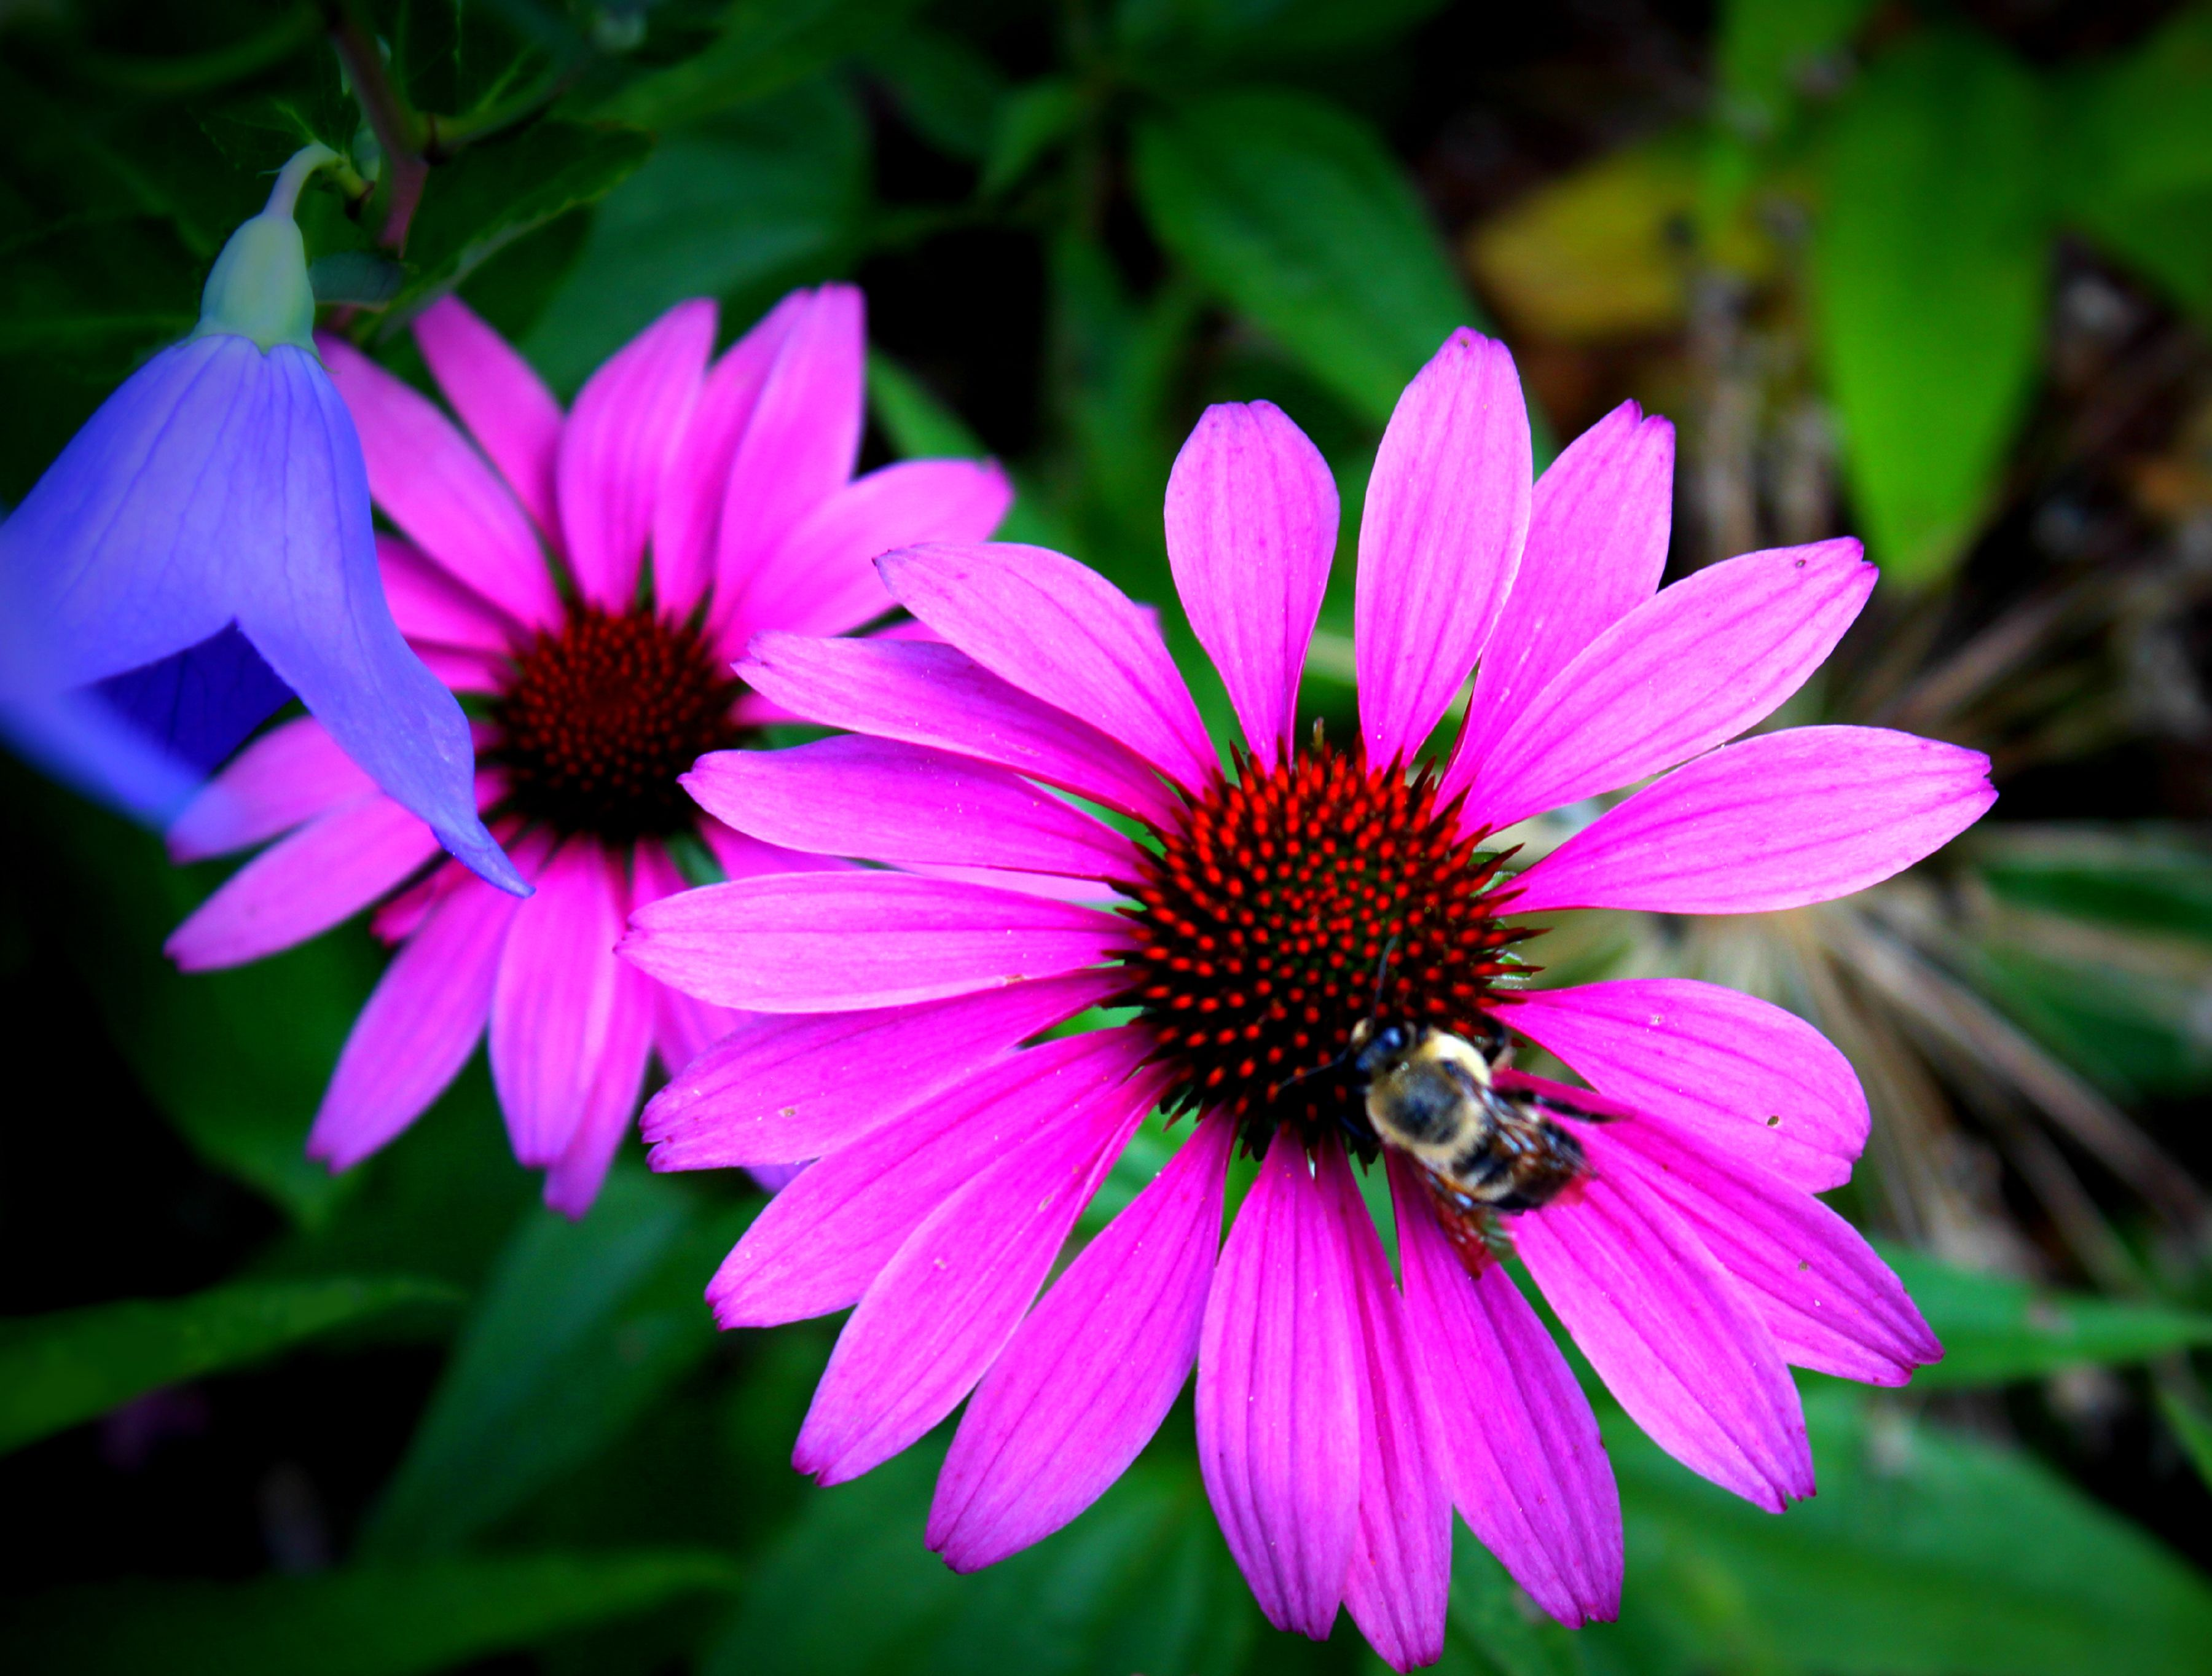 Beautiful flowersg 36002728 flower gardenflowers beautiful flowers images izmirmasajfo Choice Image